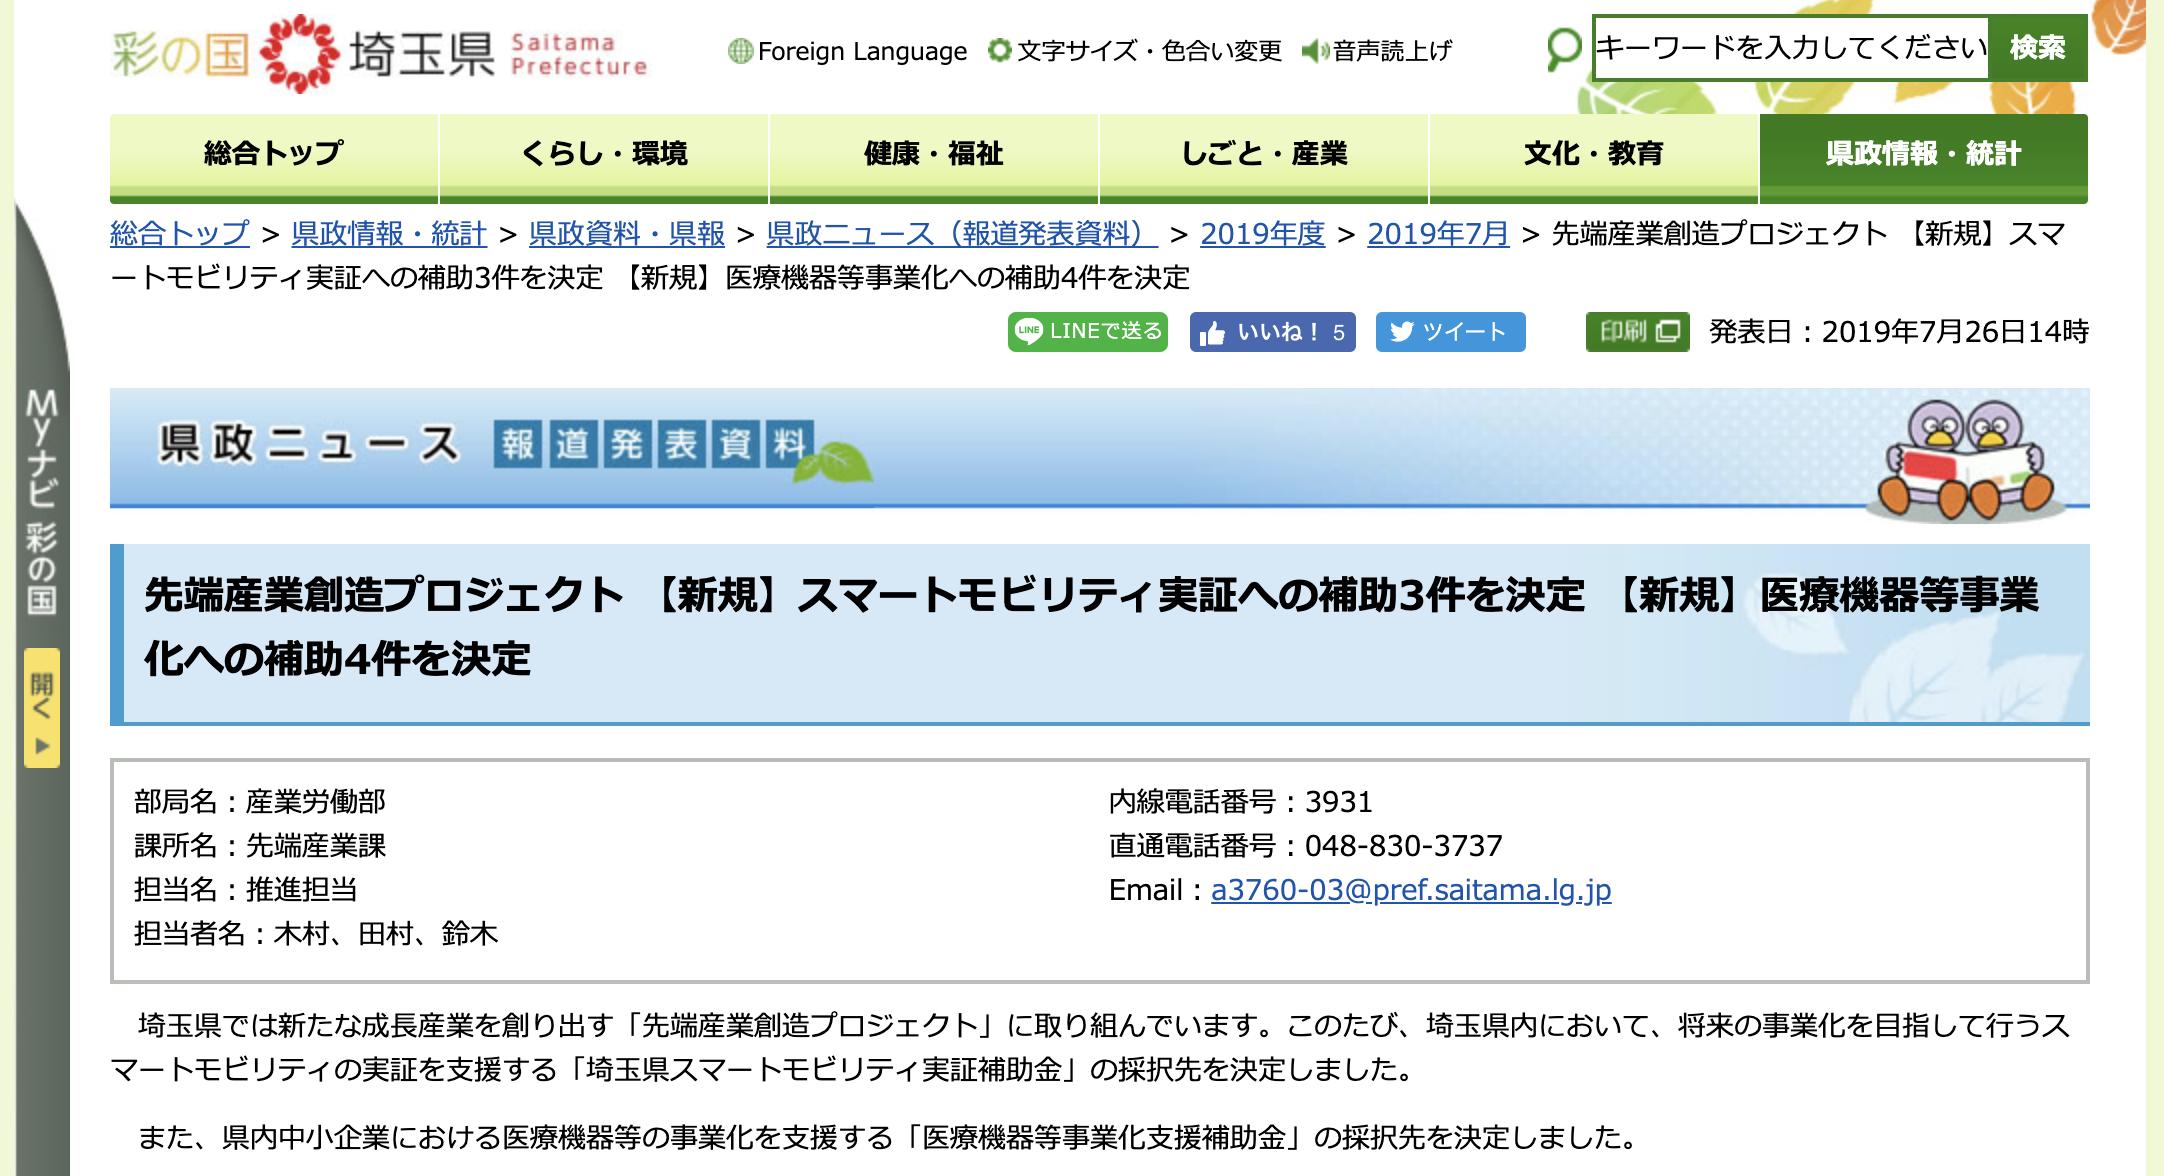 埼玉県、自動運転の実証実験支援へ3団体に補助金 埼玉高速鉄道、埼玉工業大学、ビコー